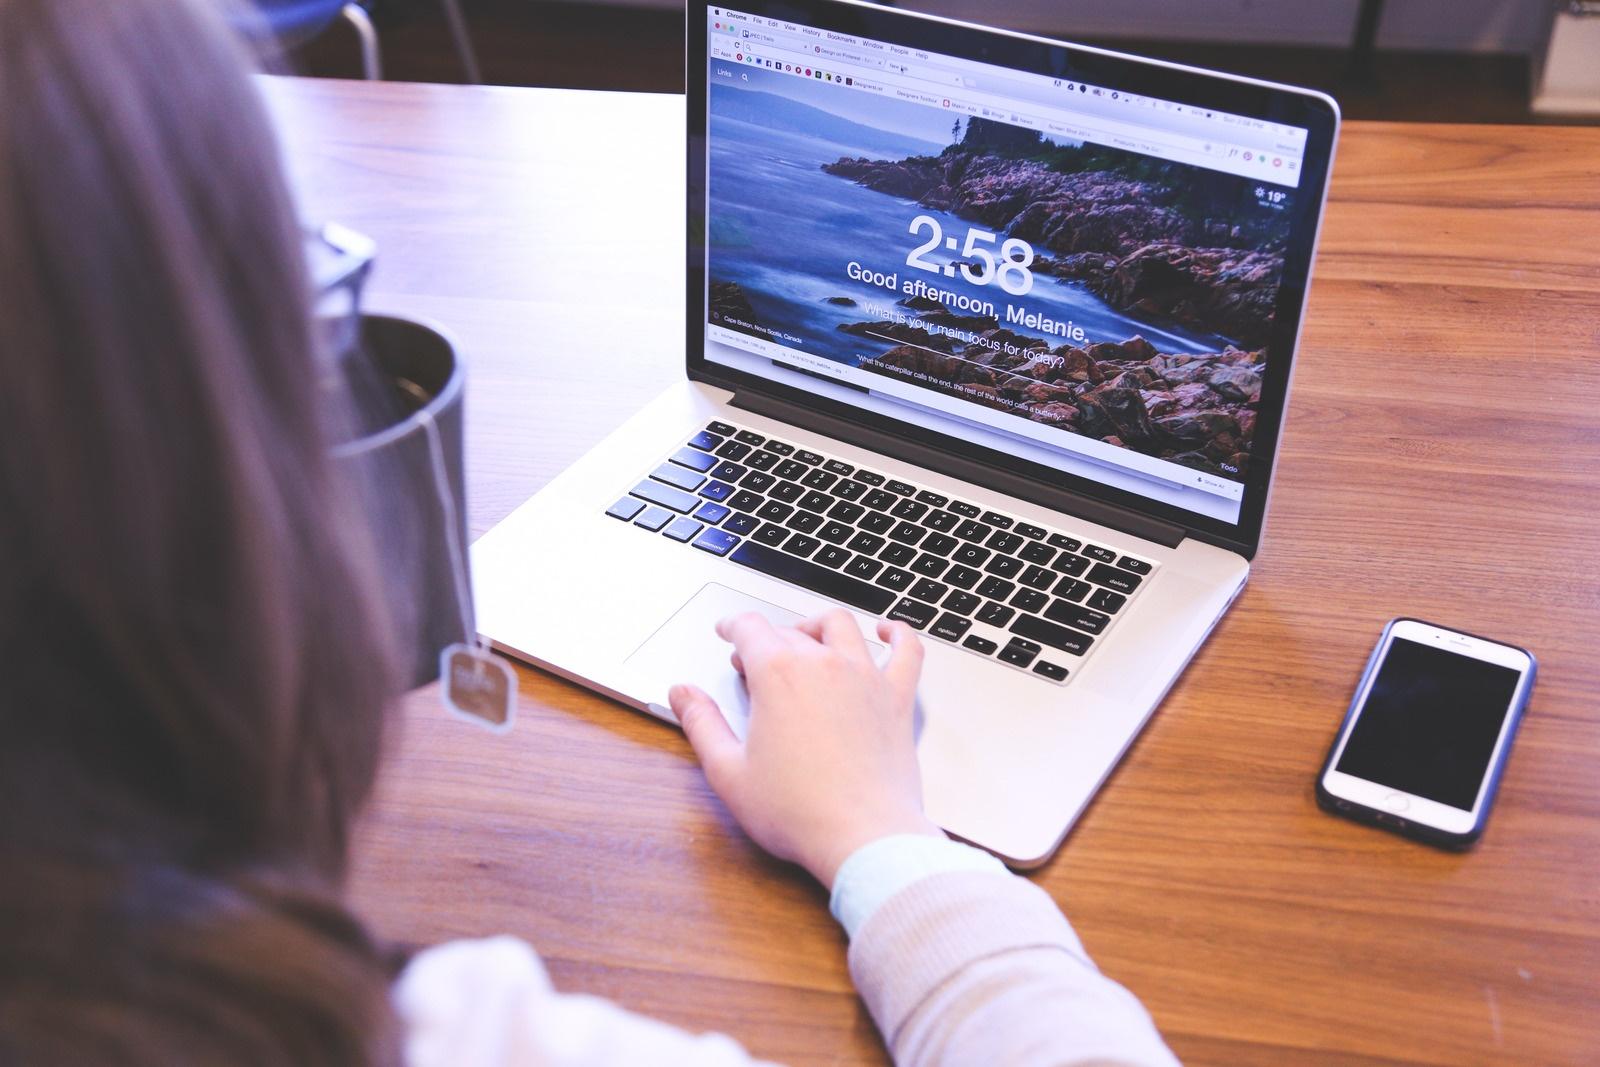 canva-woman-using-macbook-pro-on-table-MADGyAqCAvw